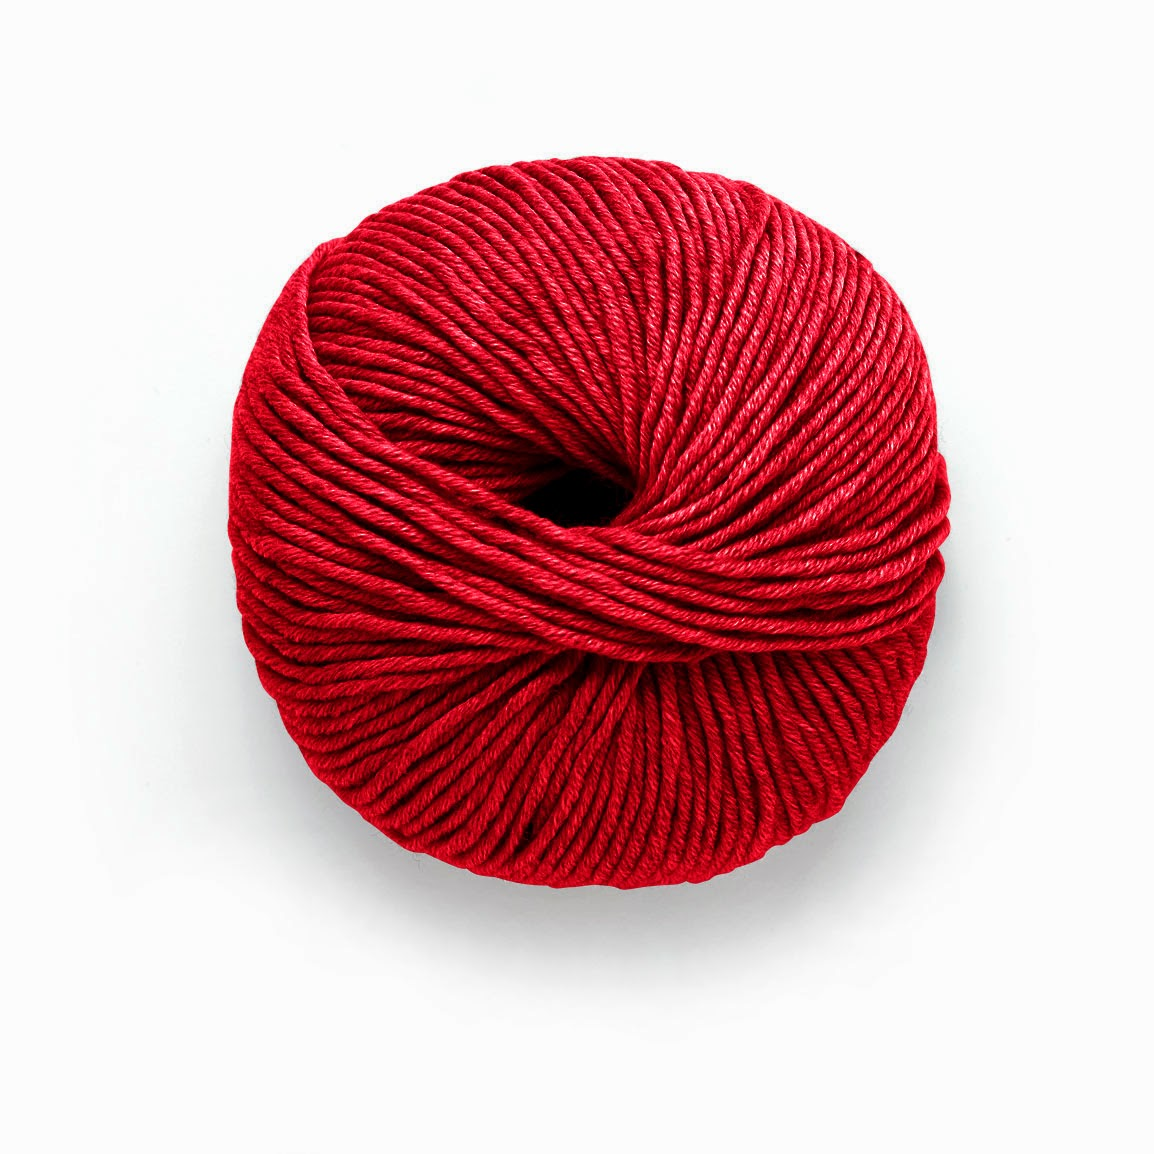 http://millamia.com/yarn.php?type=Aran&range=brights&id=37